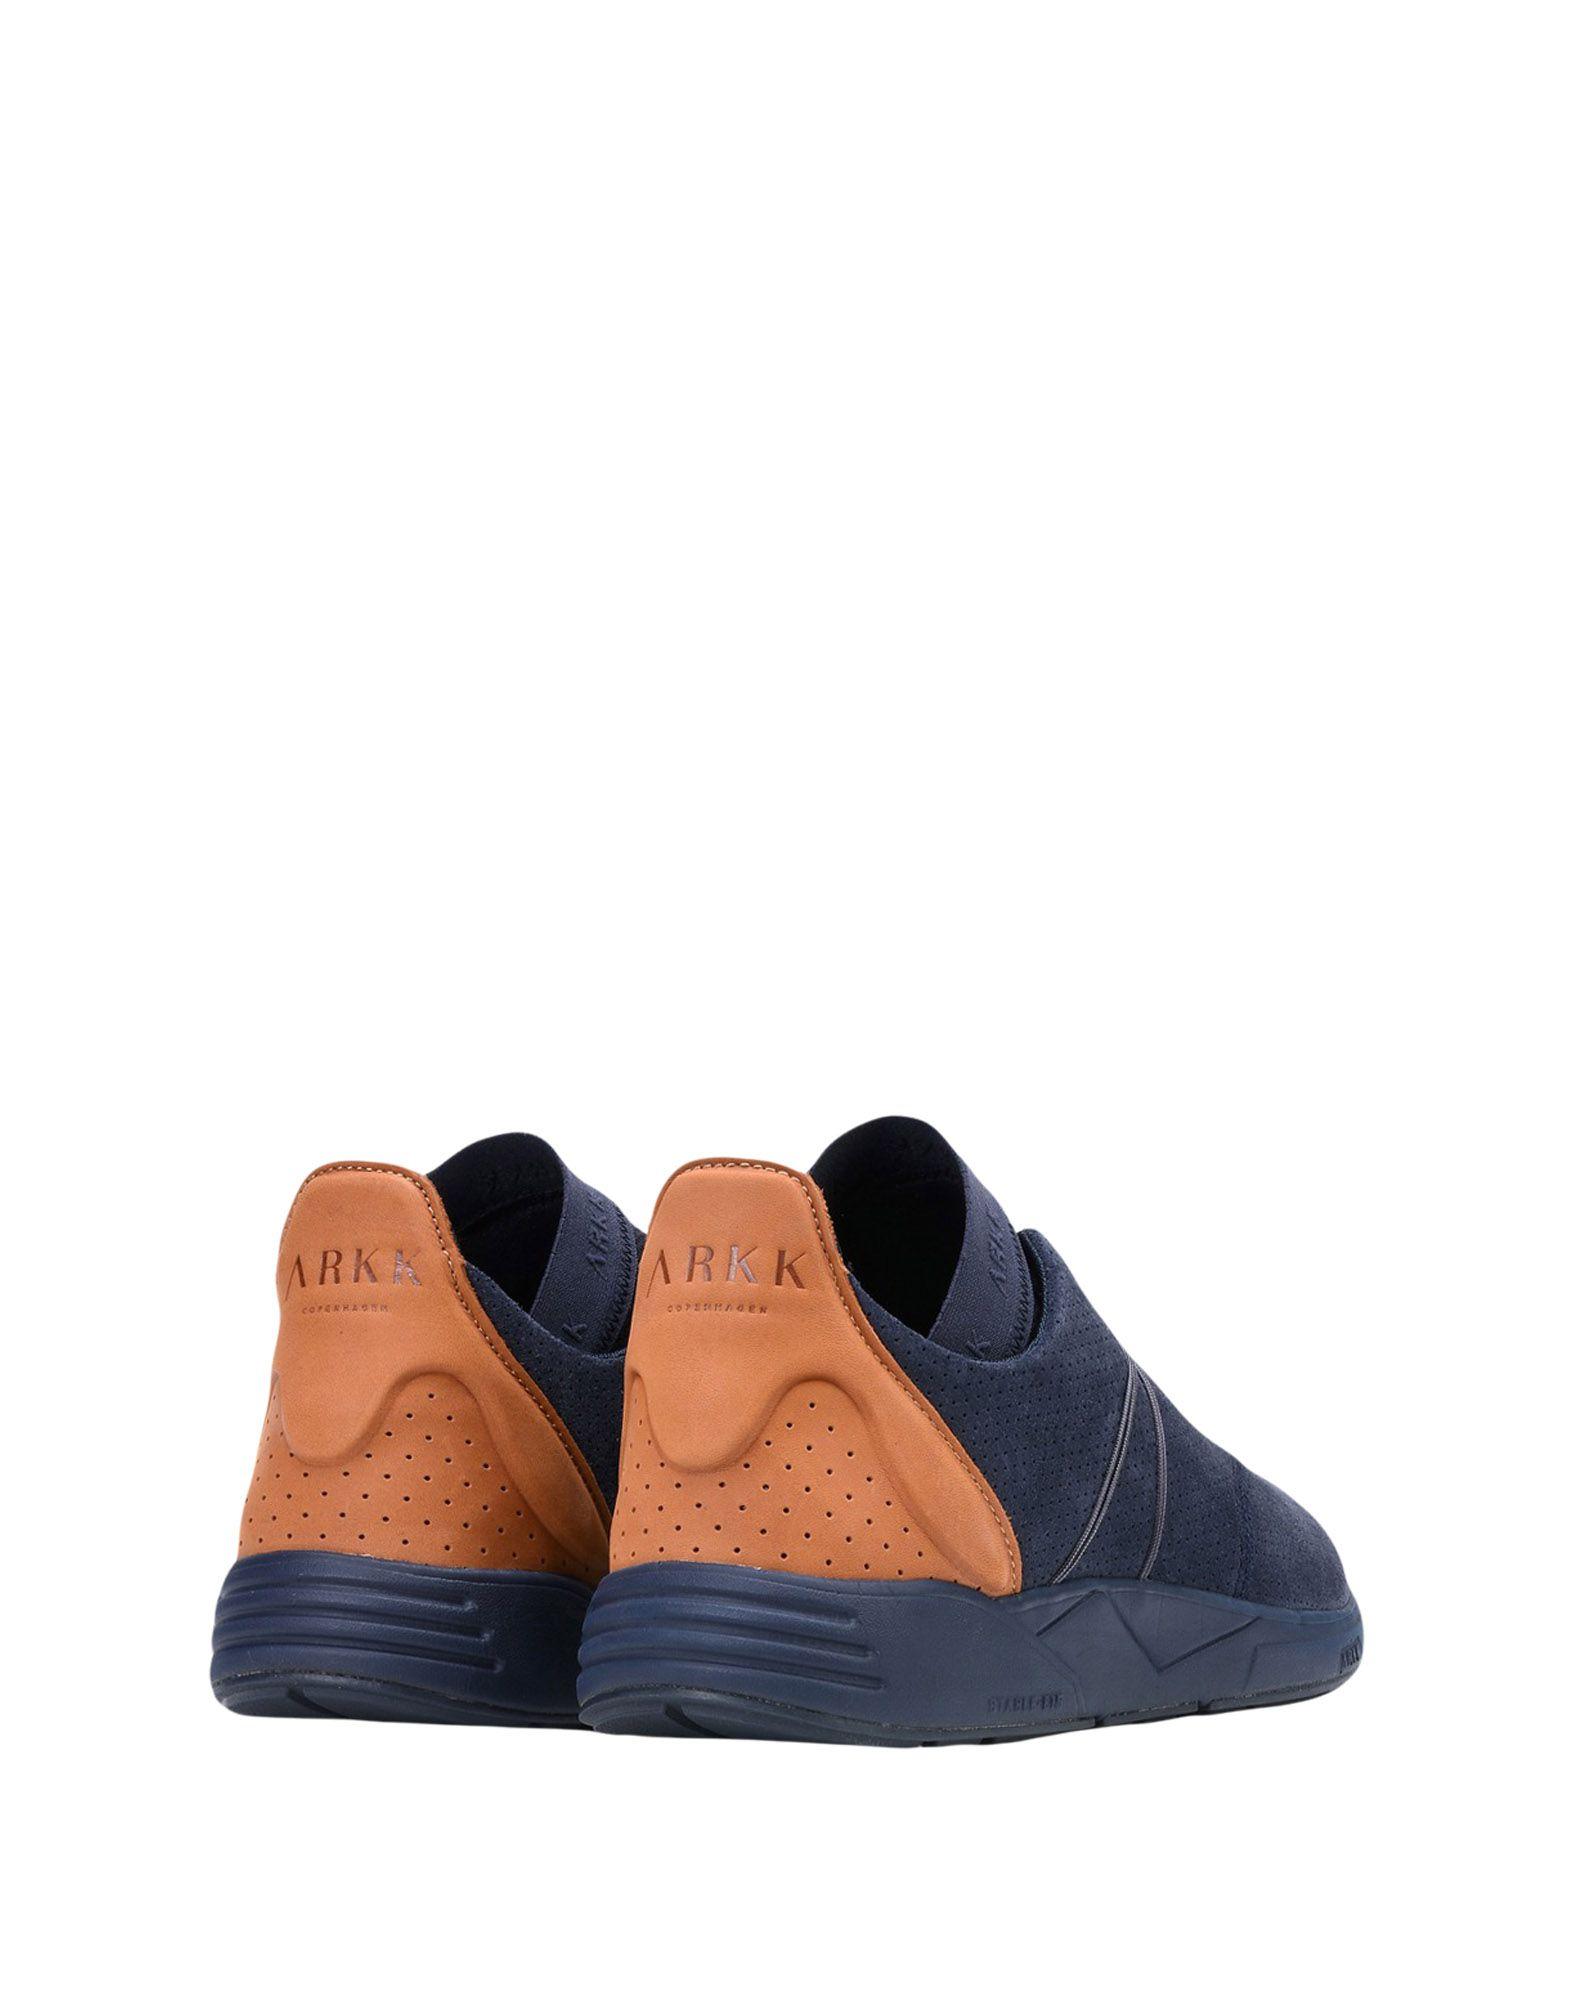 Arkk Copenhagen Gute Eaglezero Suede S 11406299GJ Gute Copenhagen Qualität beliebte Schuhe 22e668